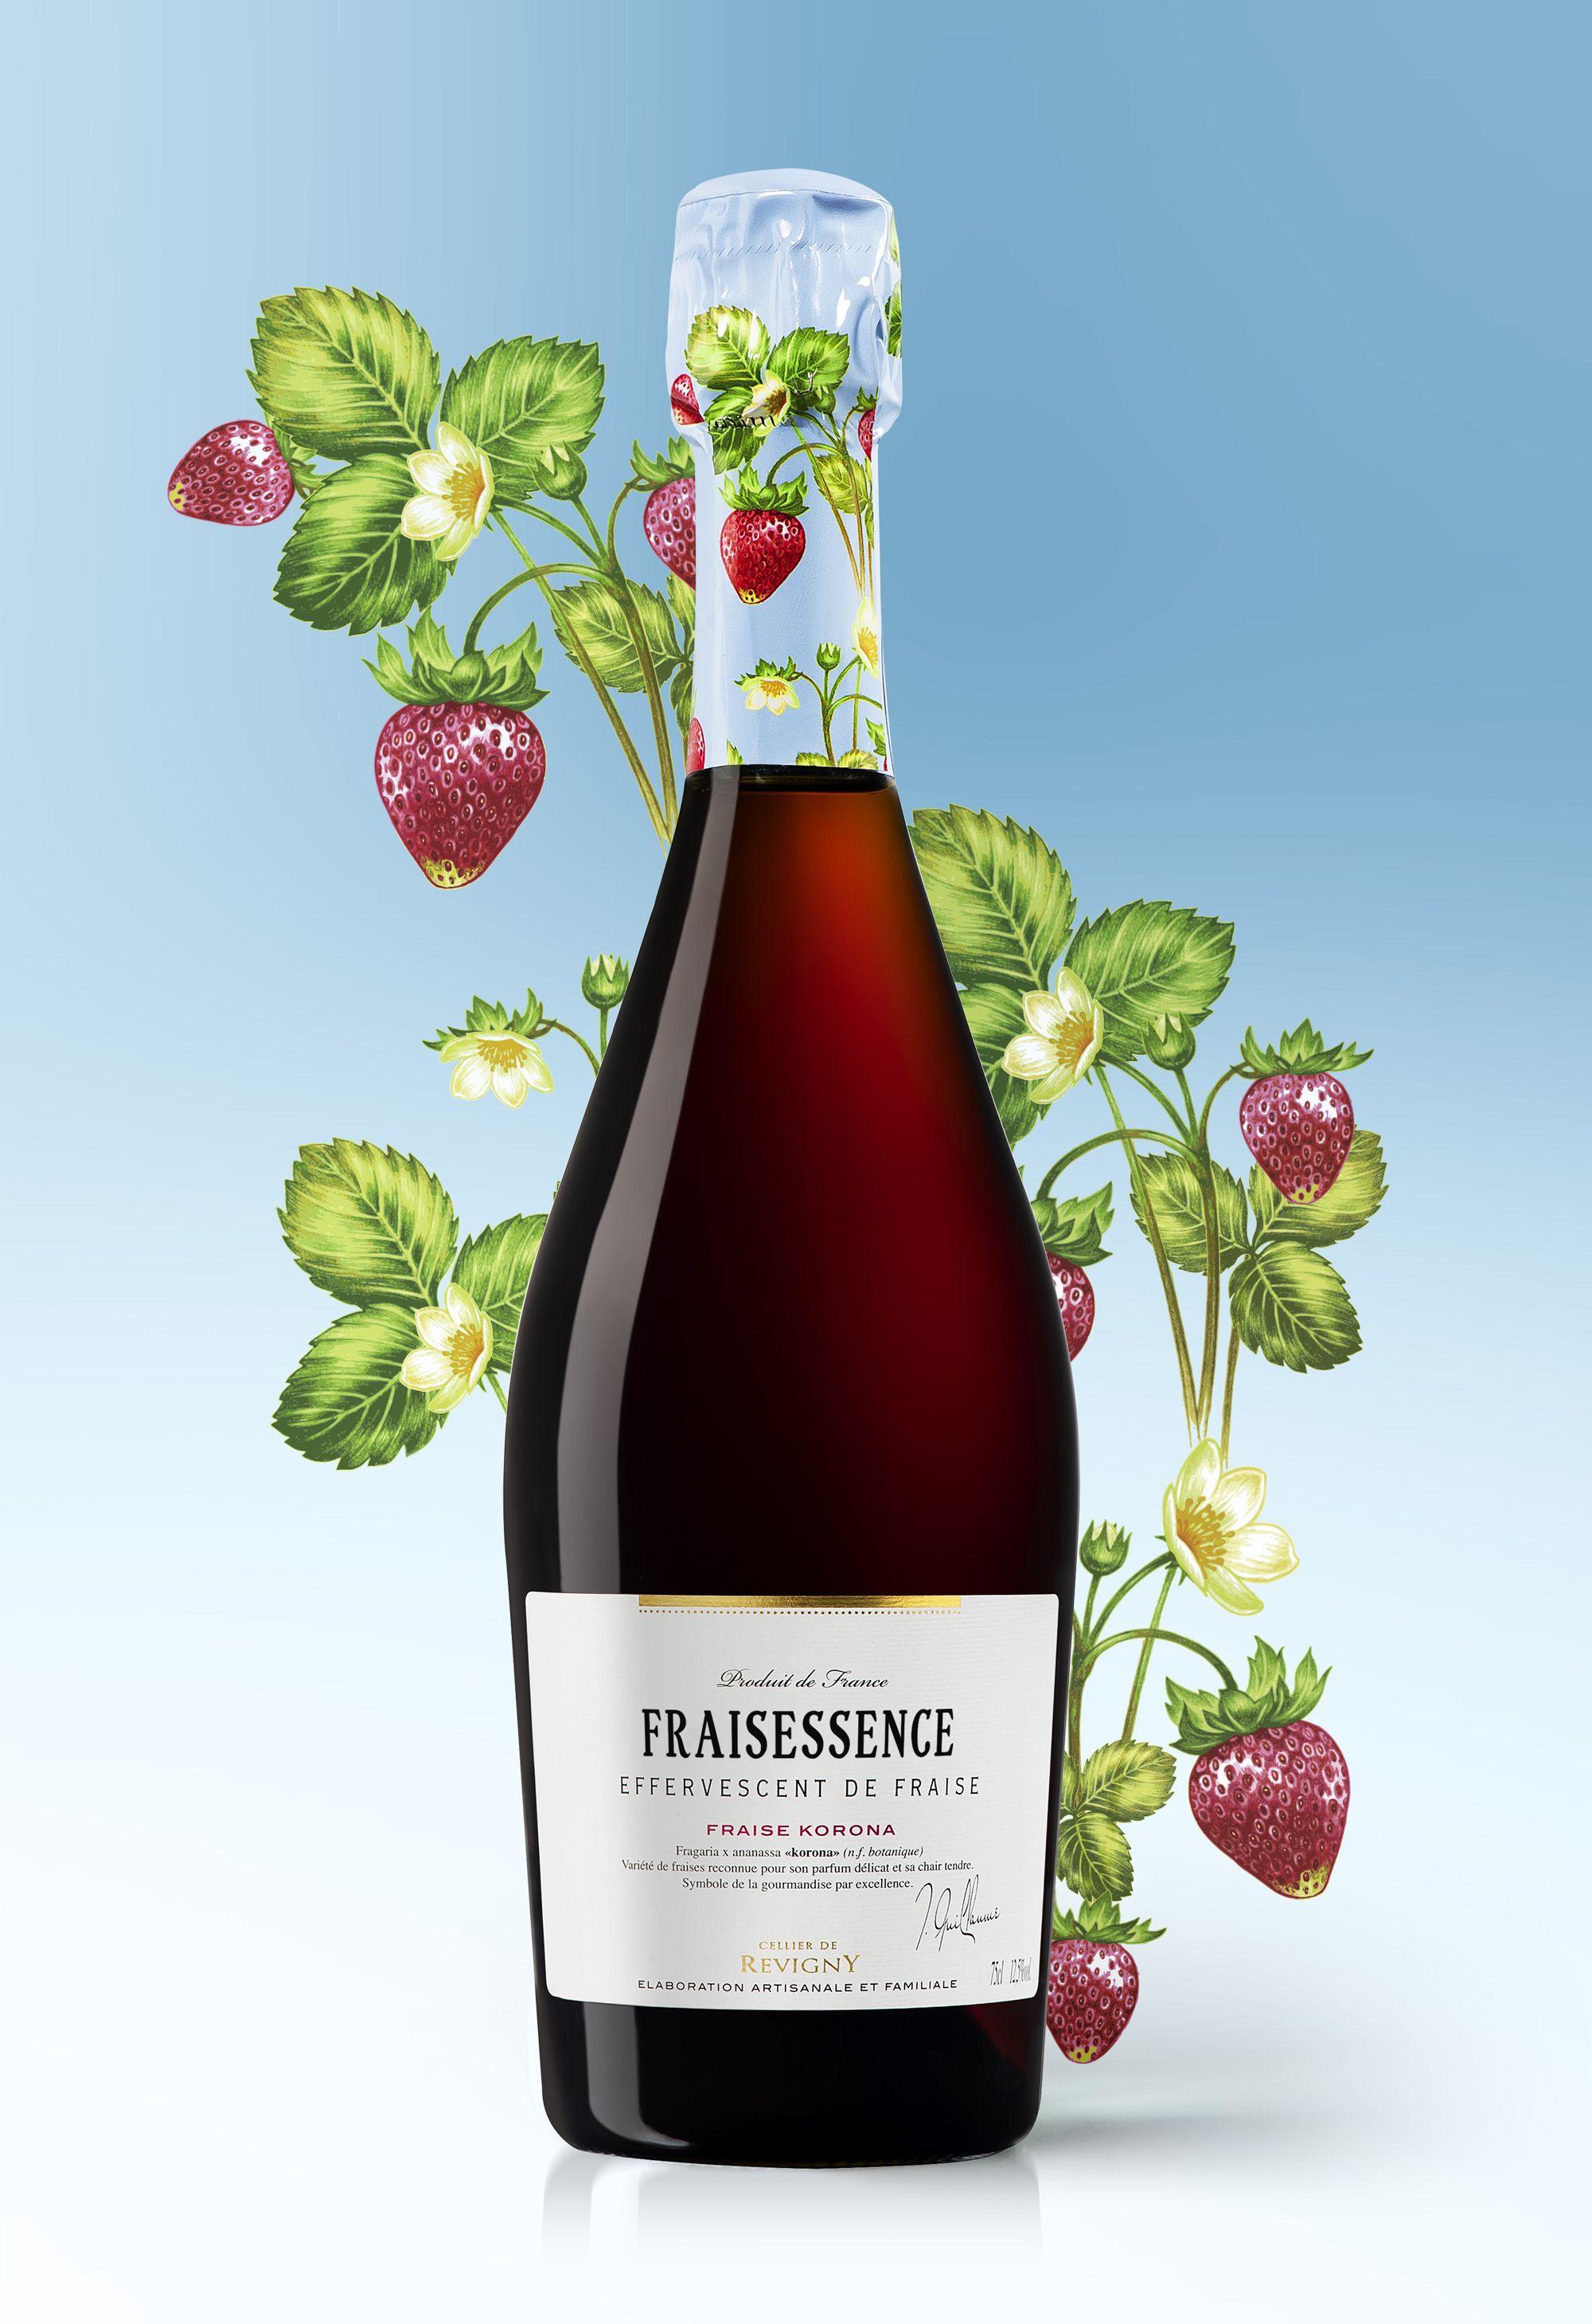 Vin pétillant effervescent de fraise fraise korona